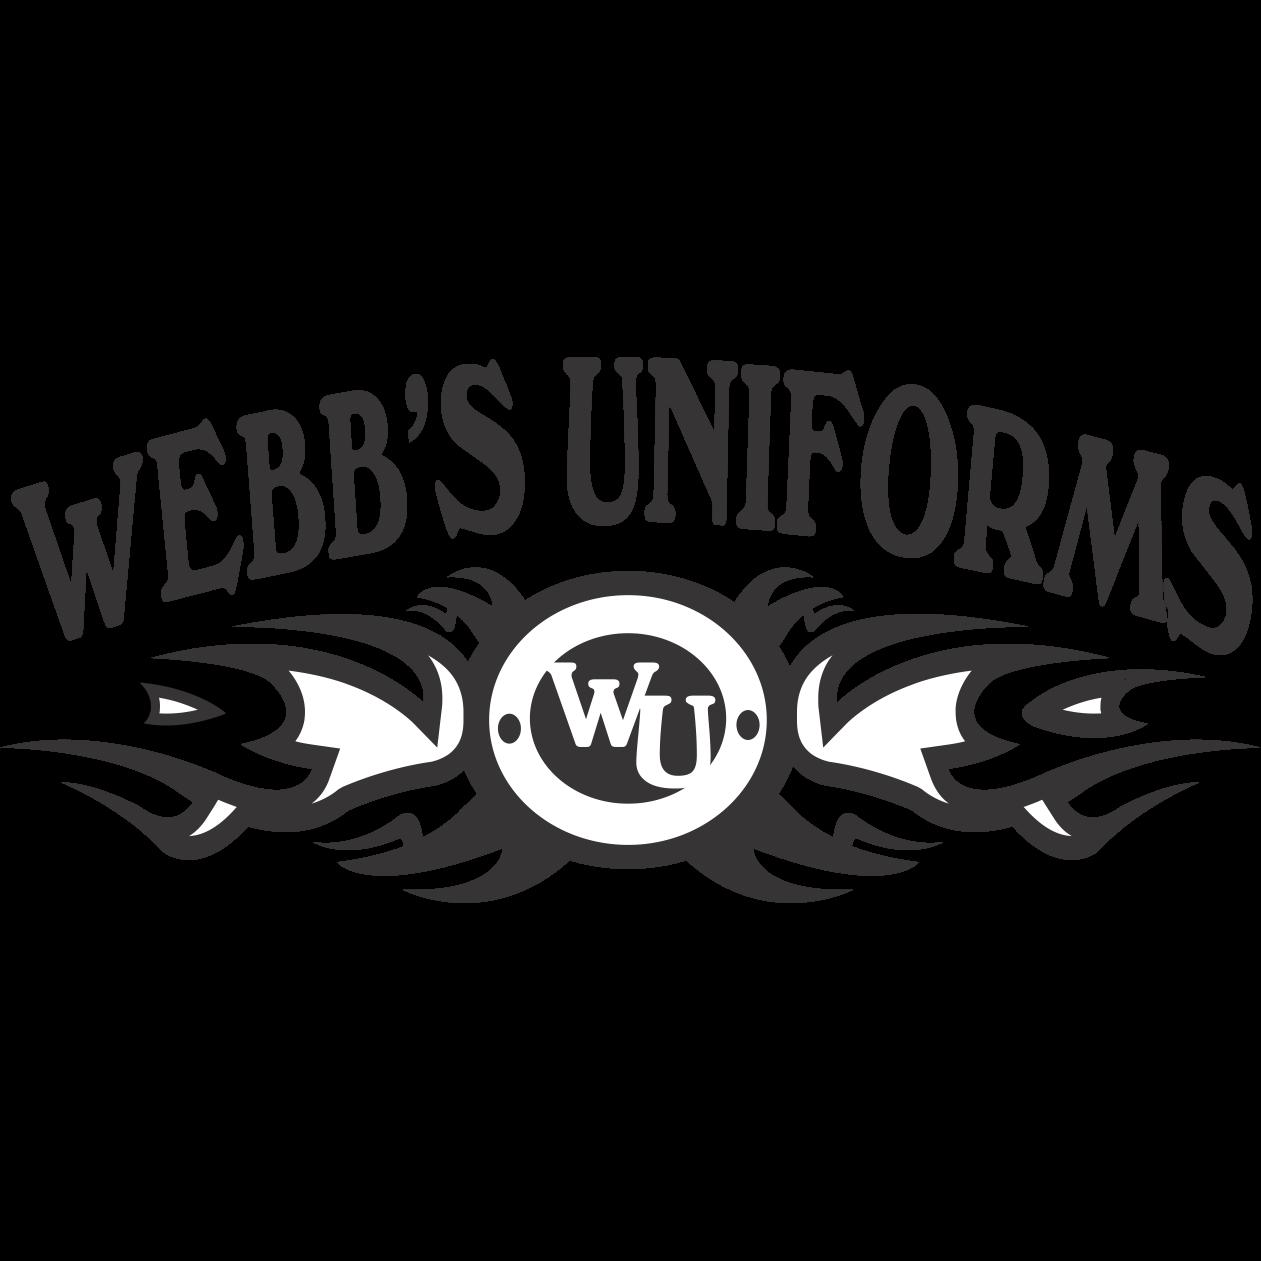 Webb's Uniforms LLC